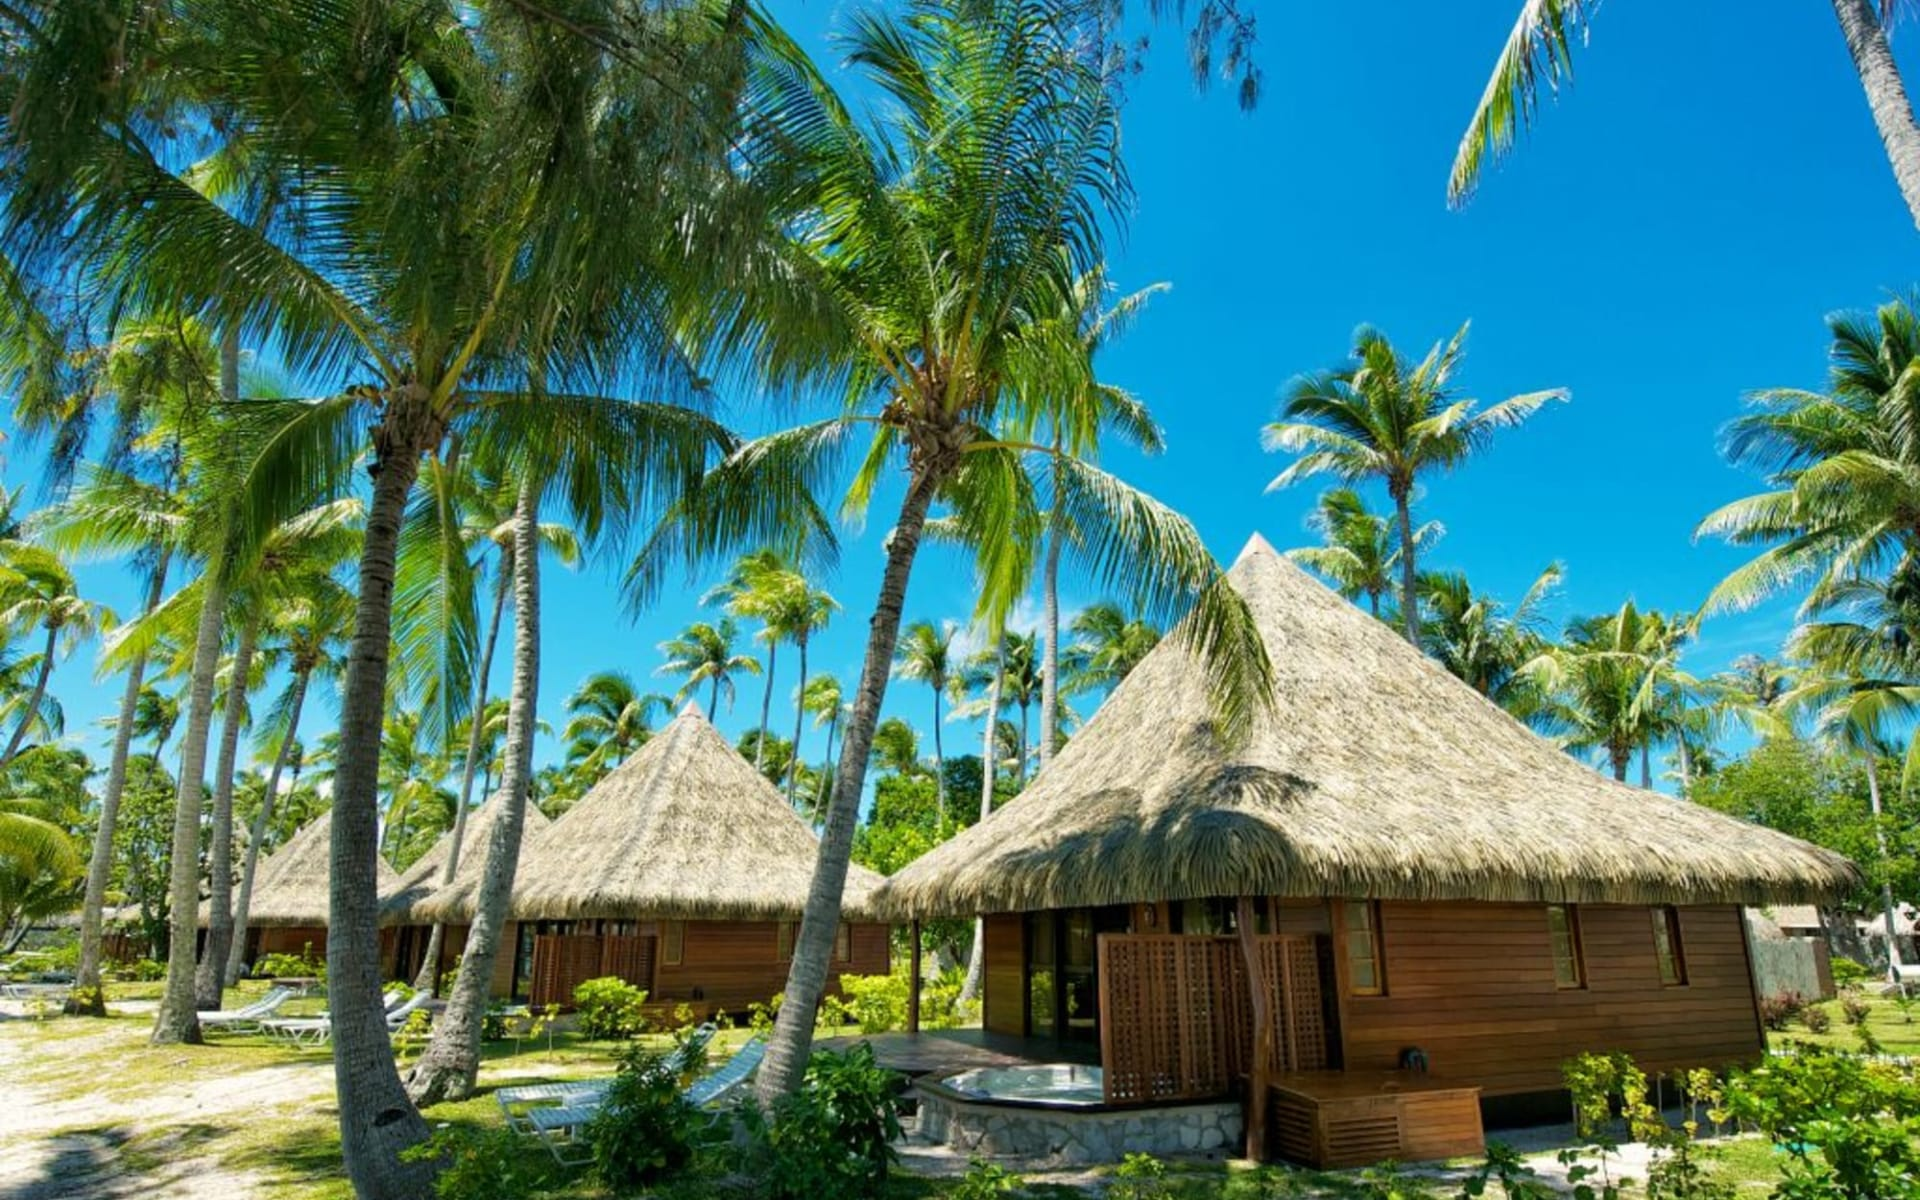 Kia Ora Resort & Spa in Rangiroa:  RGI Kia Ora_Beach Bungalow_Tim Mckenna.gallery_image.11